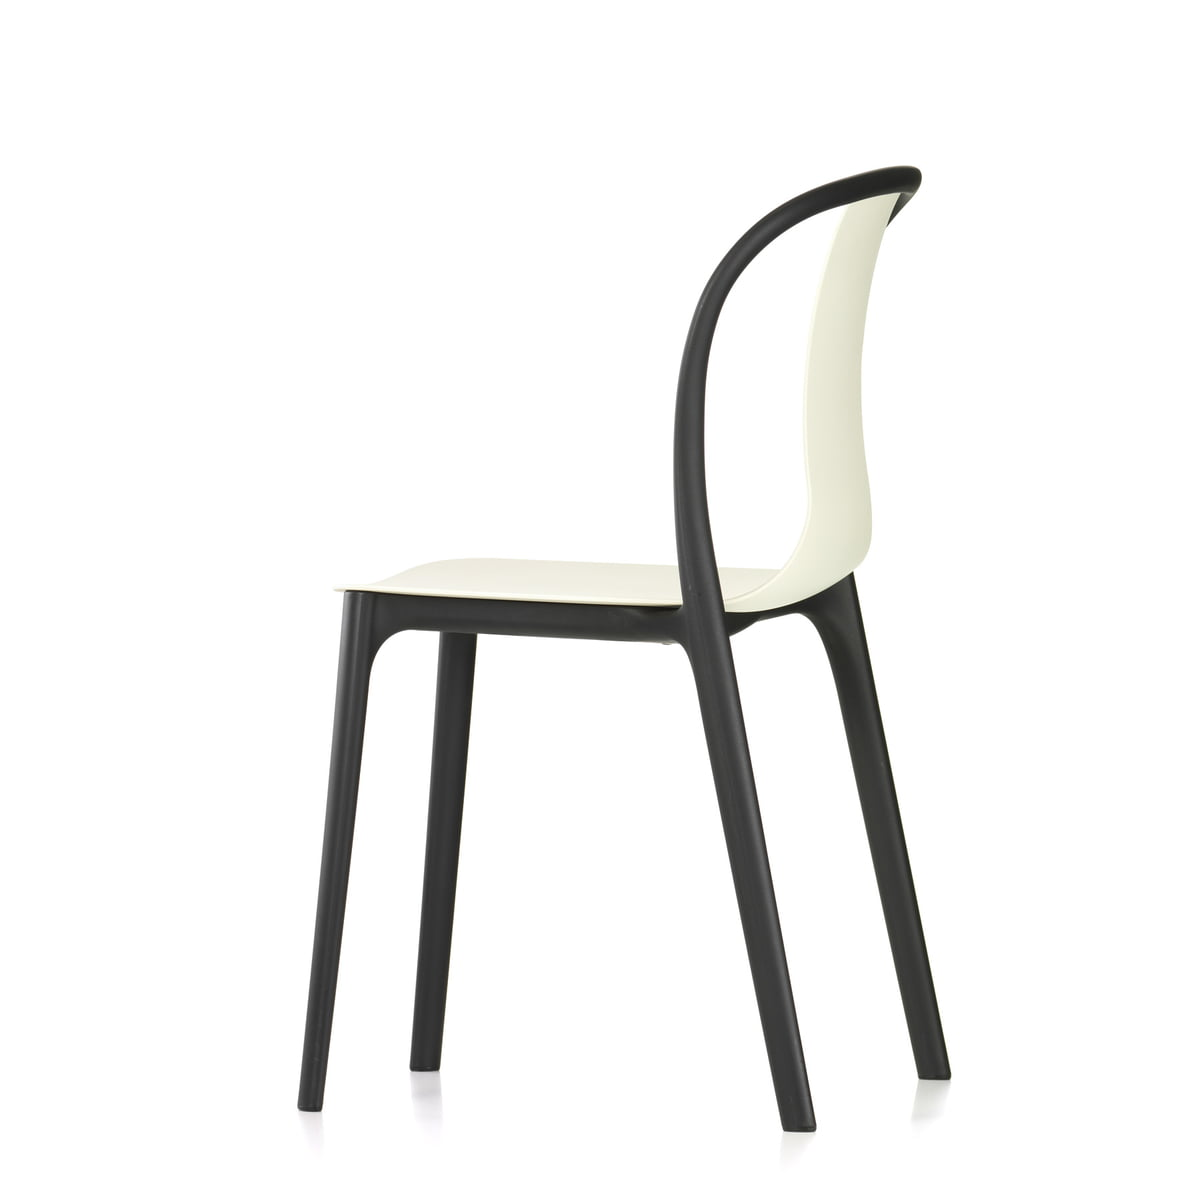 Belleville chair plastic von vitra im shop for Boutique vitra